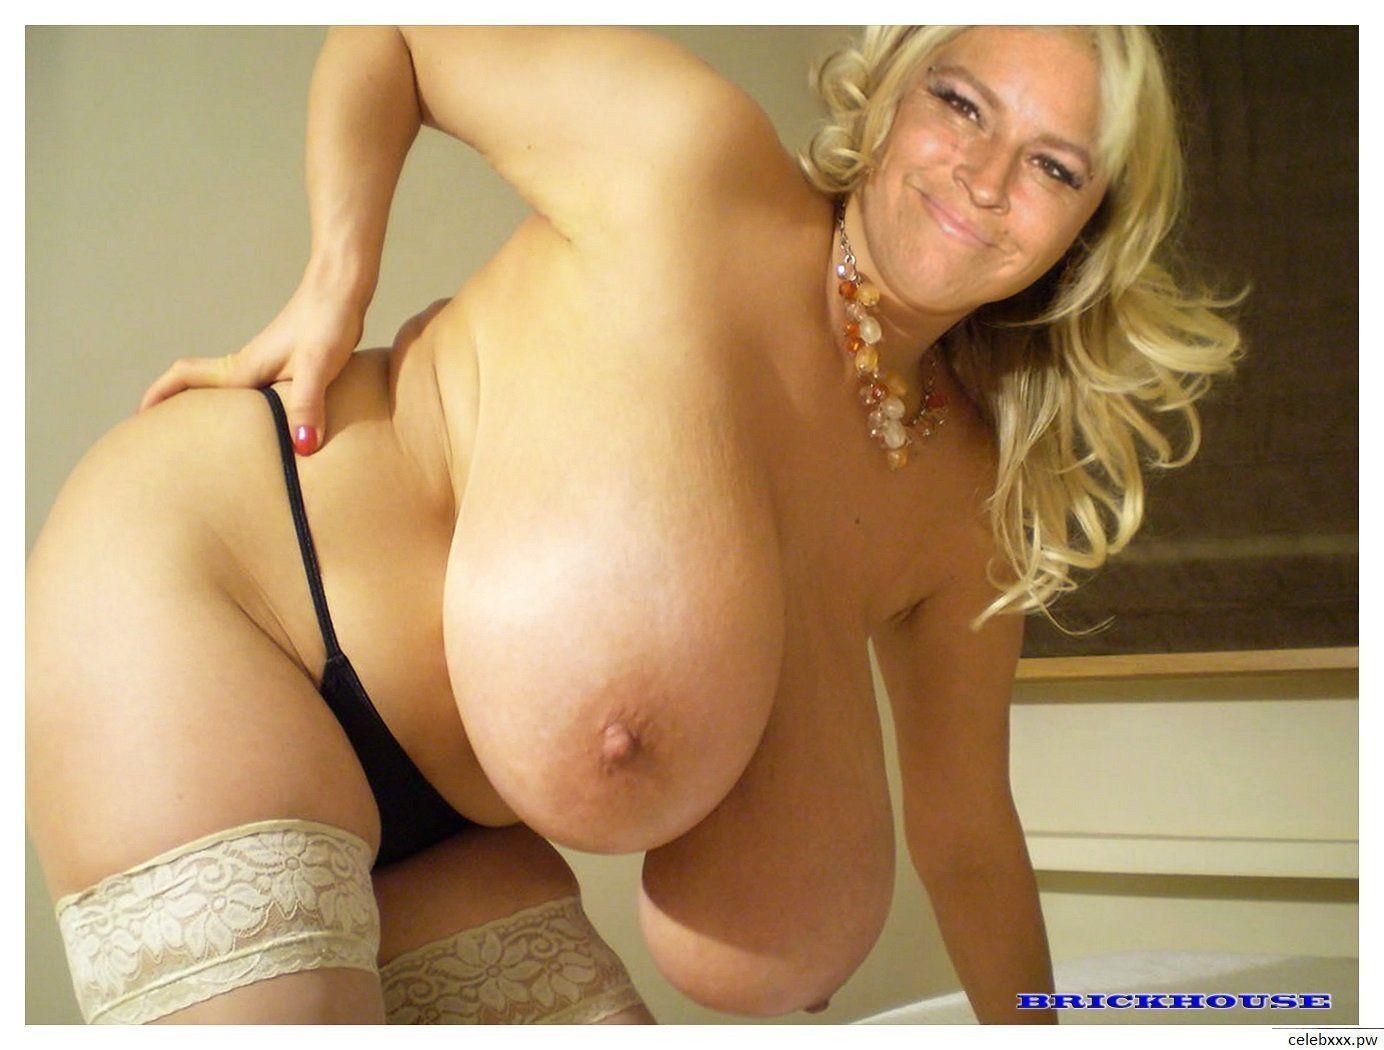 Beth bears nude